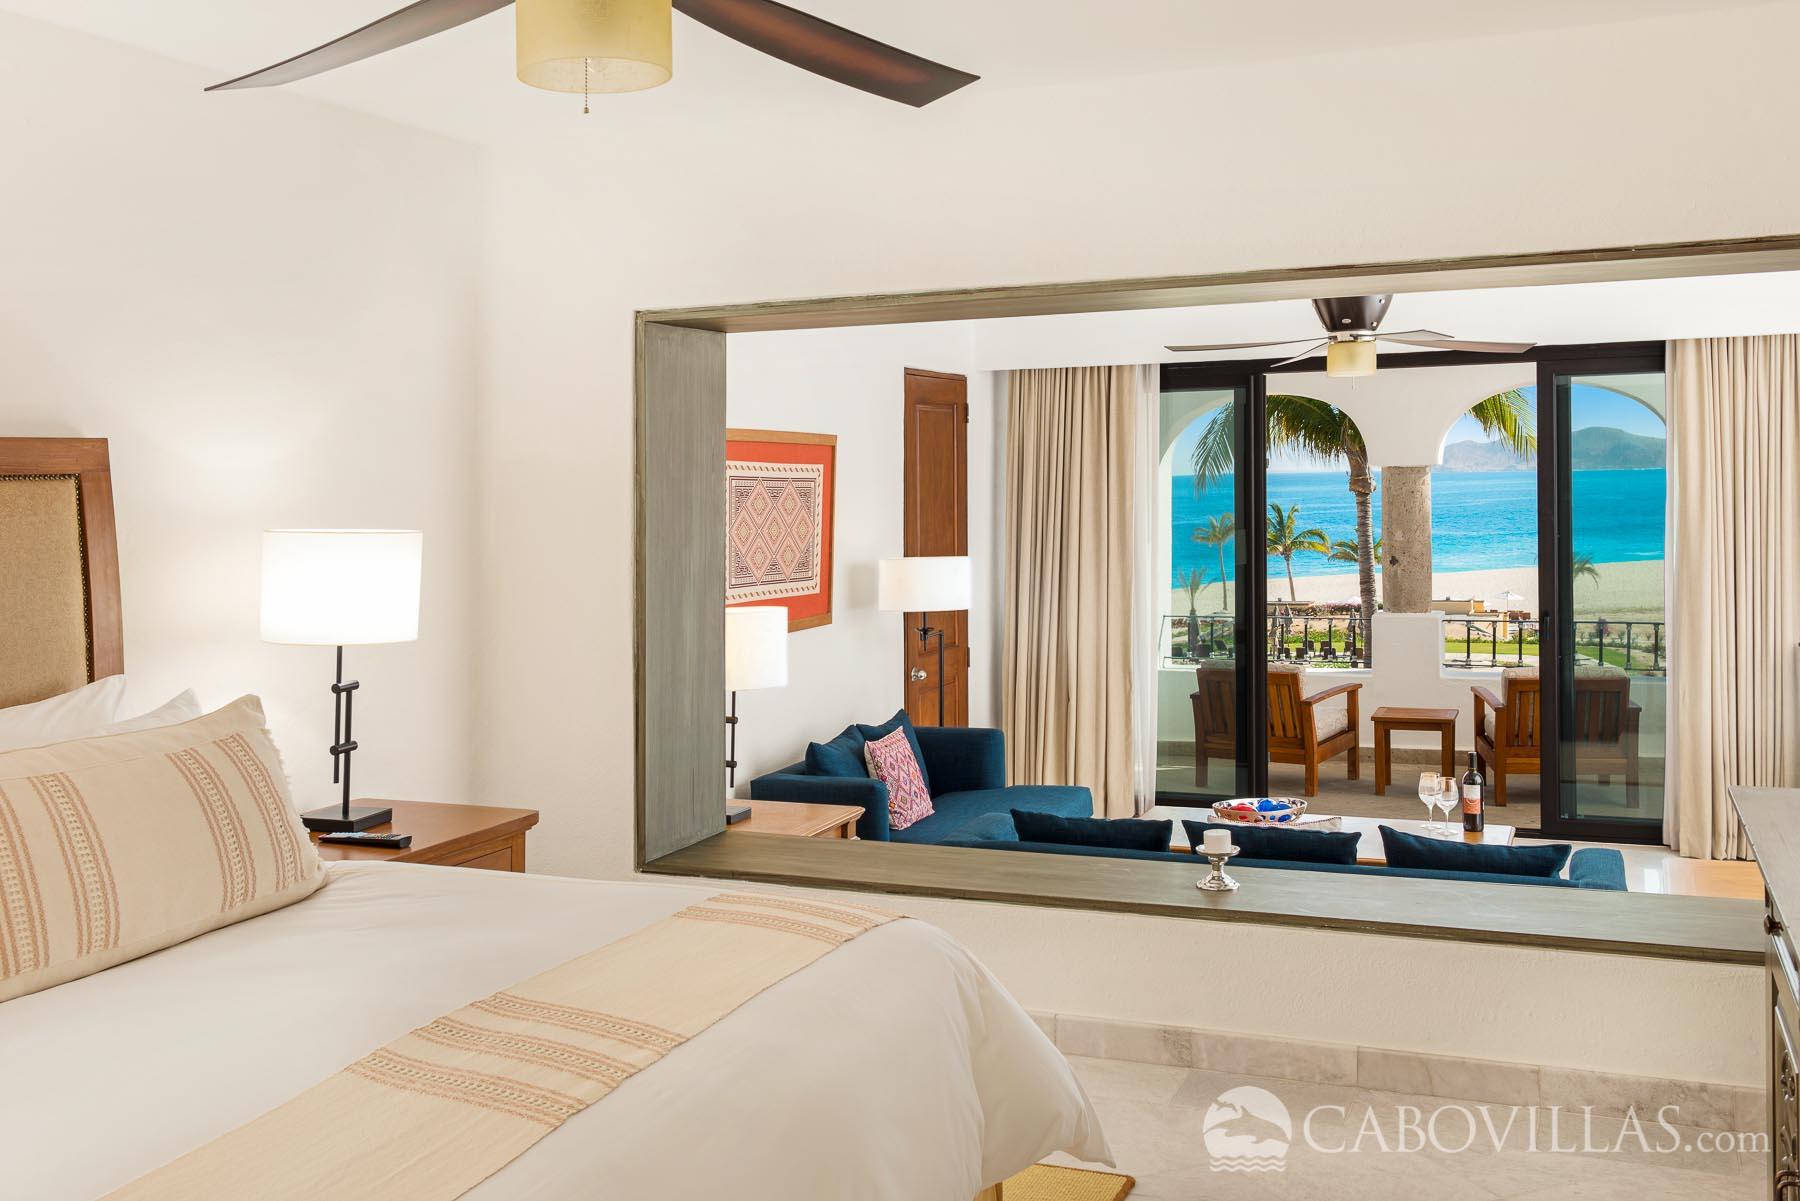 Property Gallery - Casa del Mar Golf Resort and Spa - Cabo ...